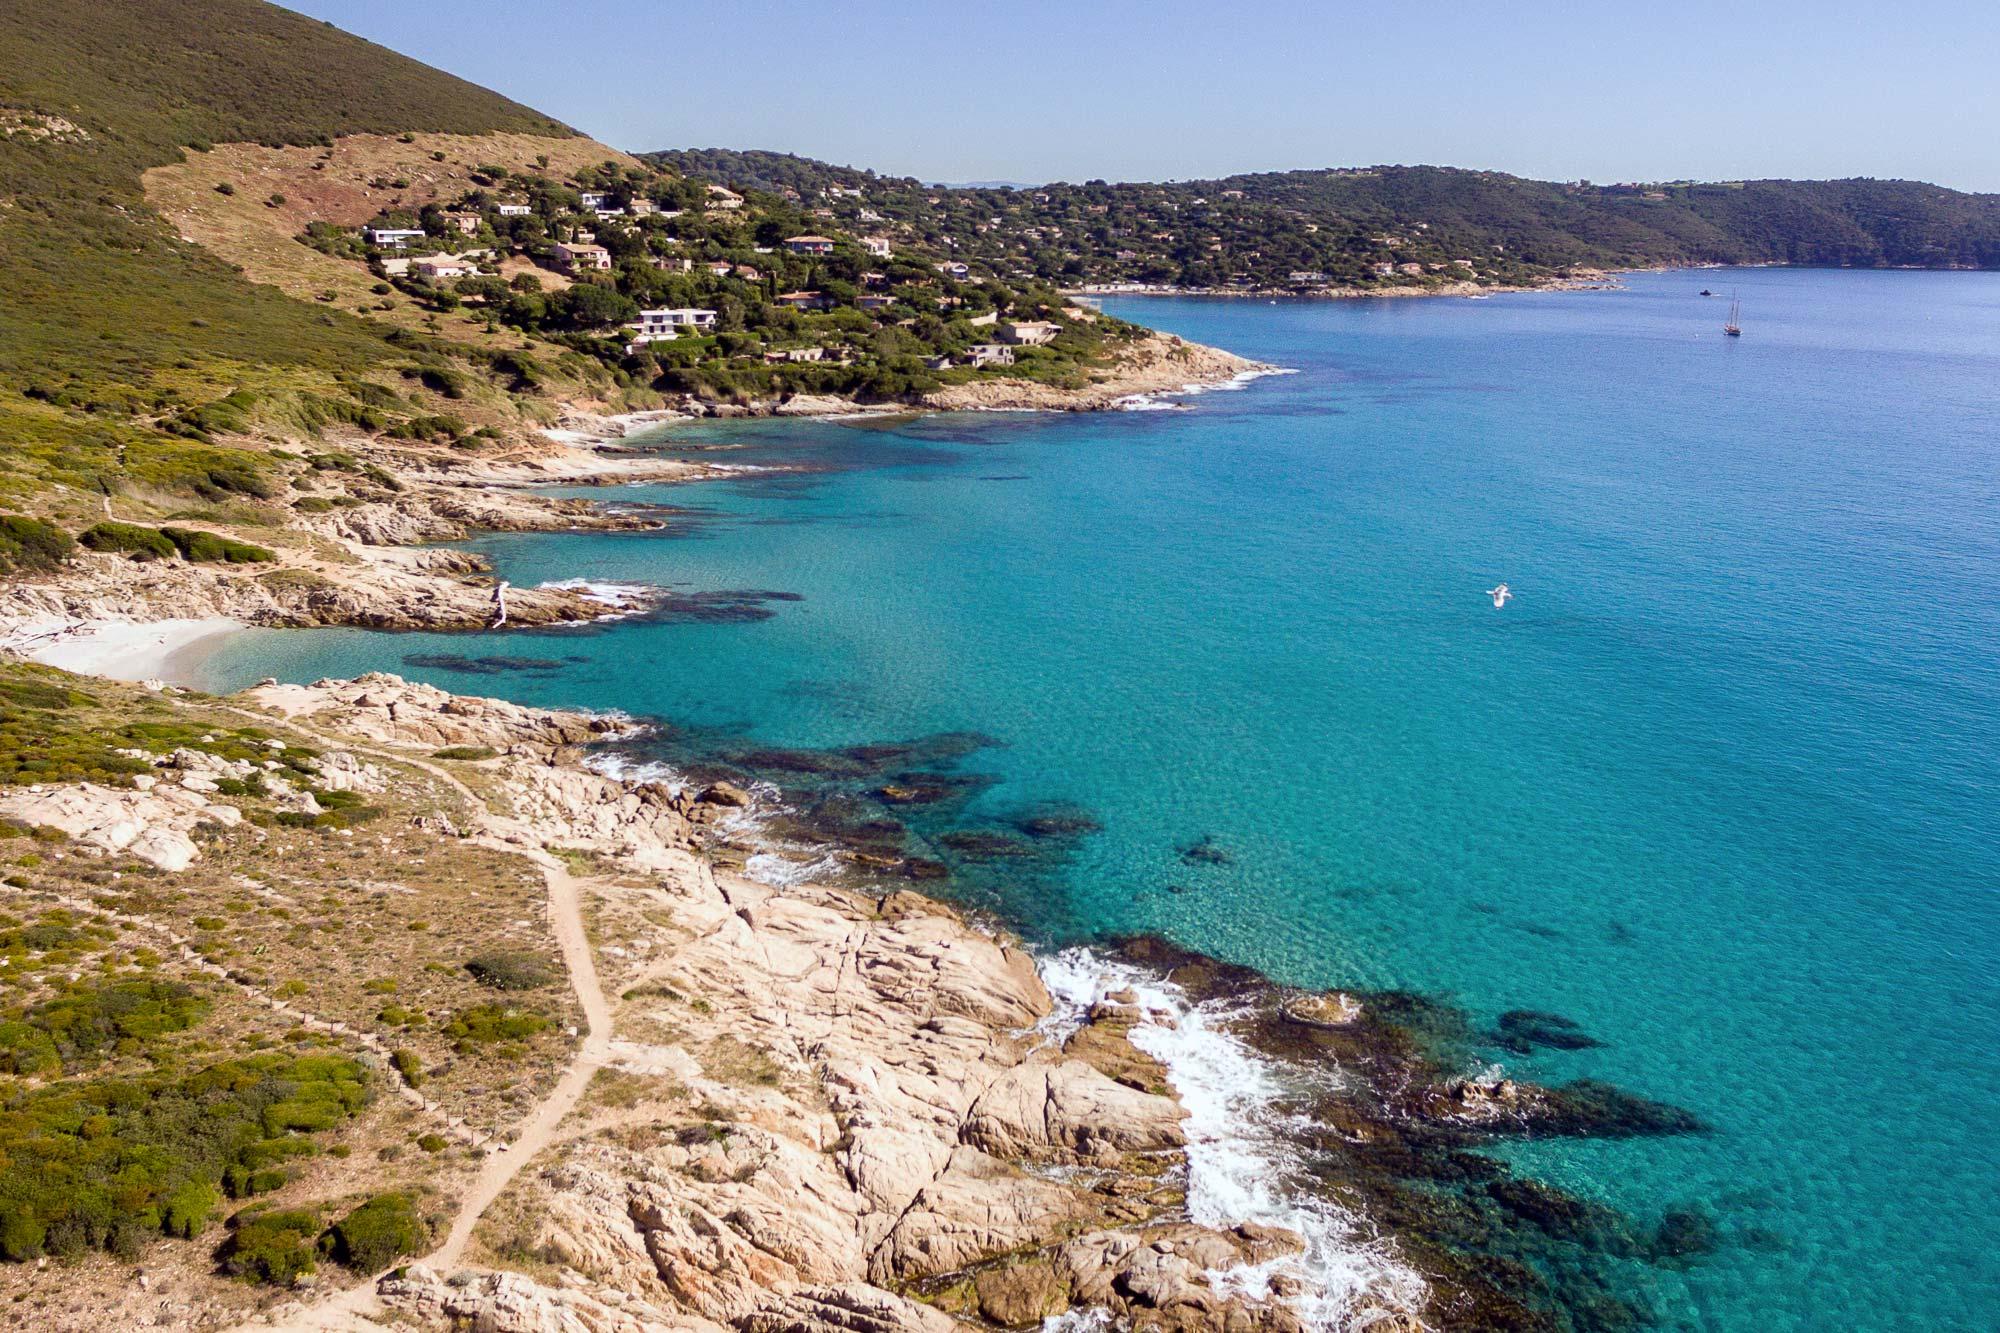 Camping Ramatuelle Cap Taillat 4 233 Toiles 224 Saint Tropez